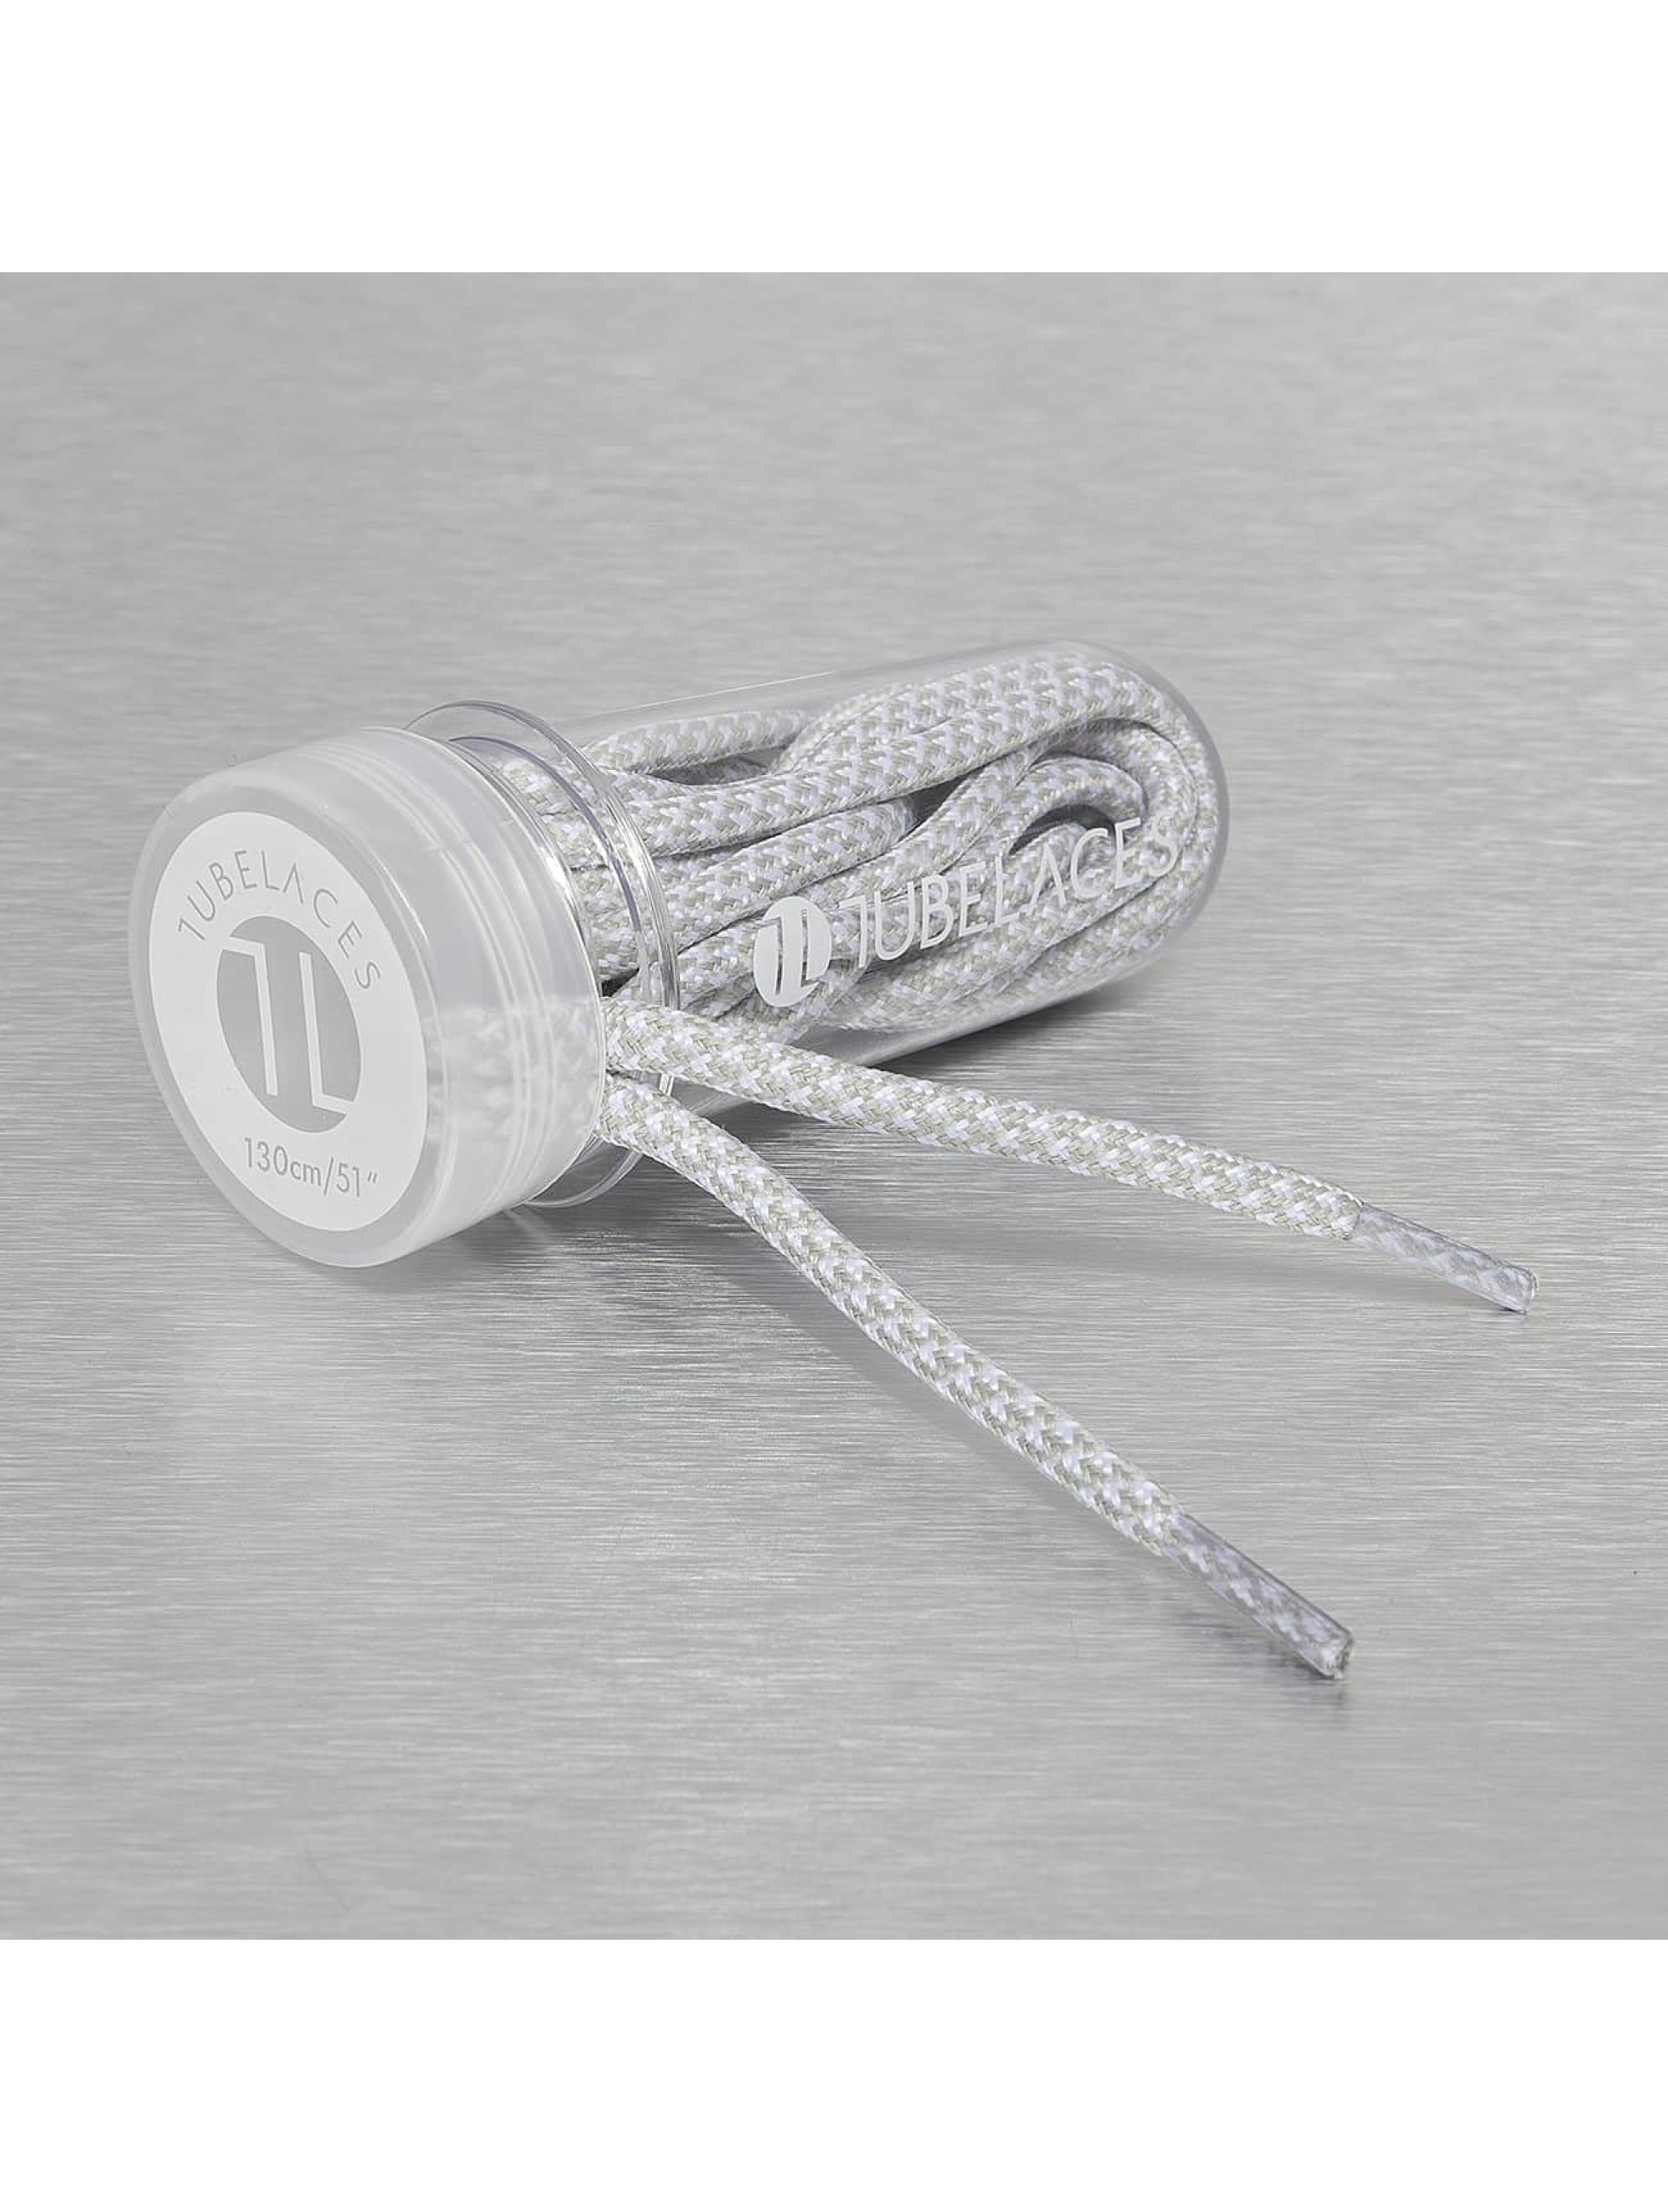 Tubelaces Schuhzubehör Rope Multi weiß